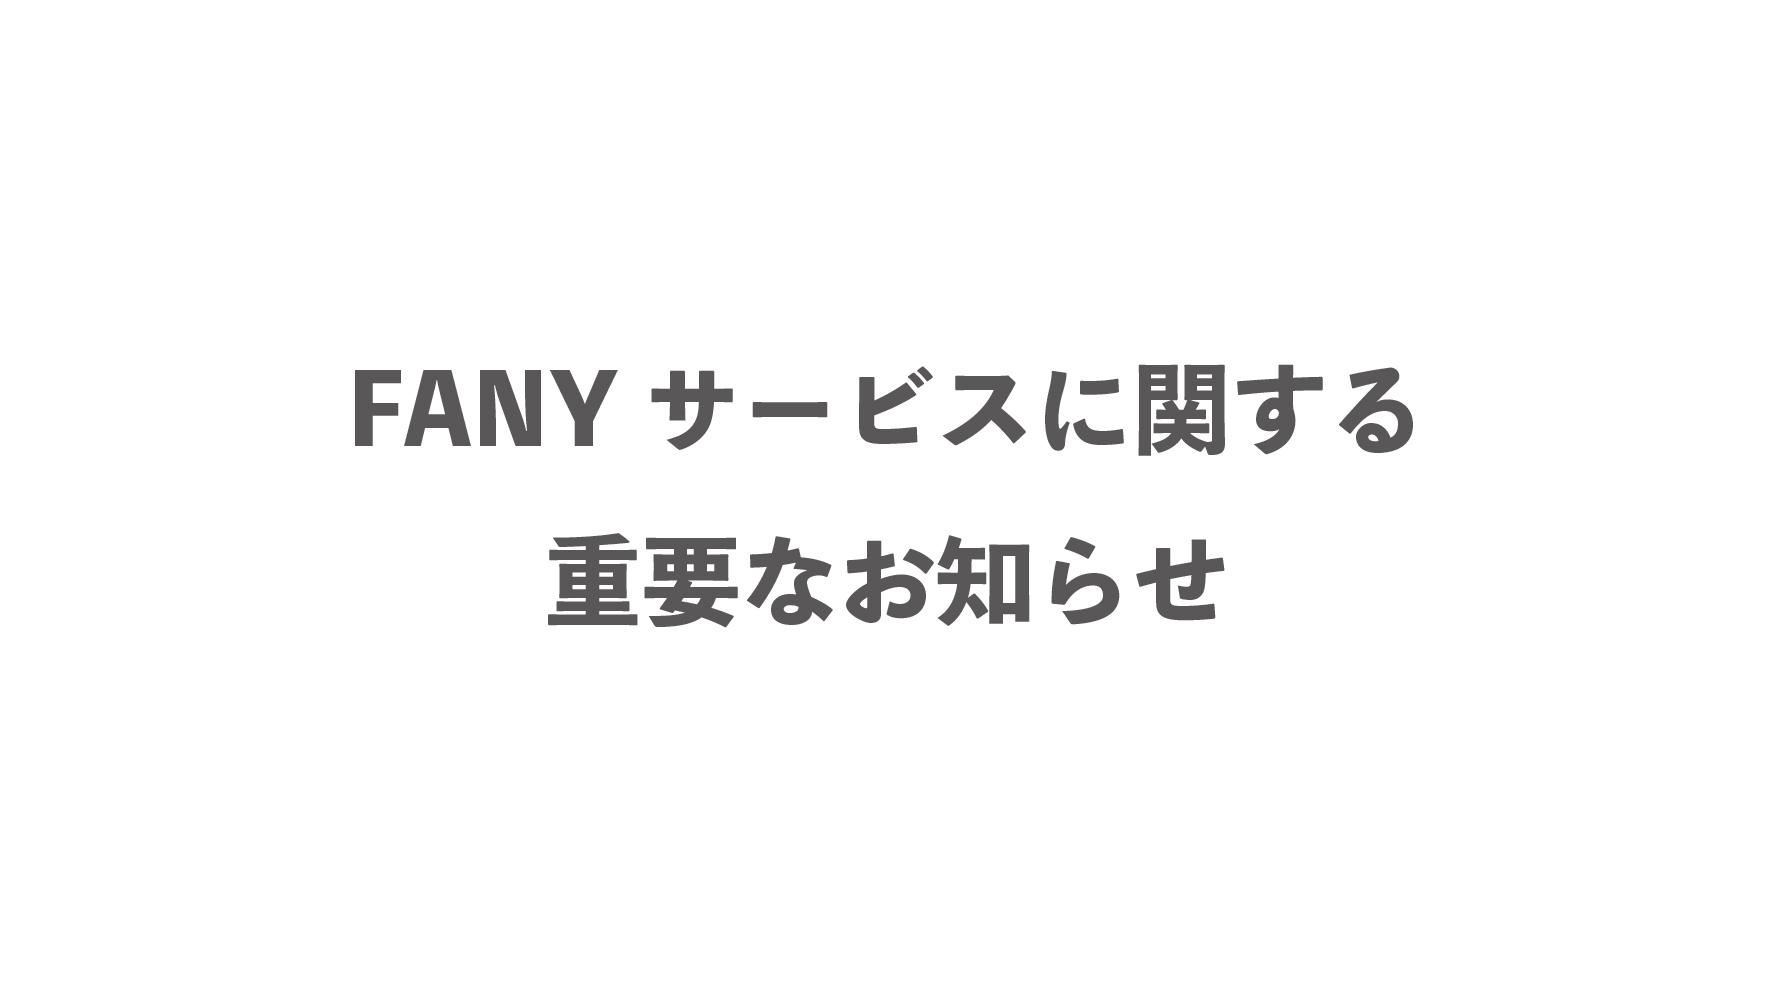 FANY IDメンテナンスのお知らせ